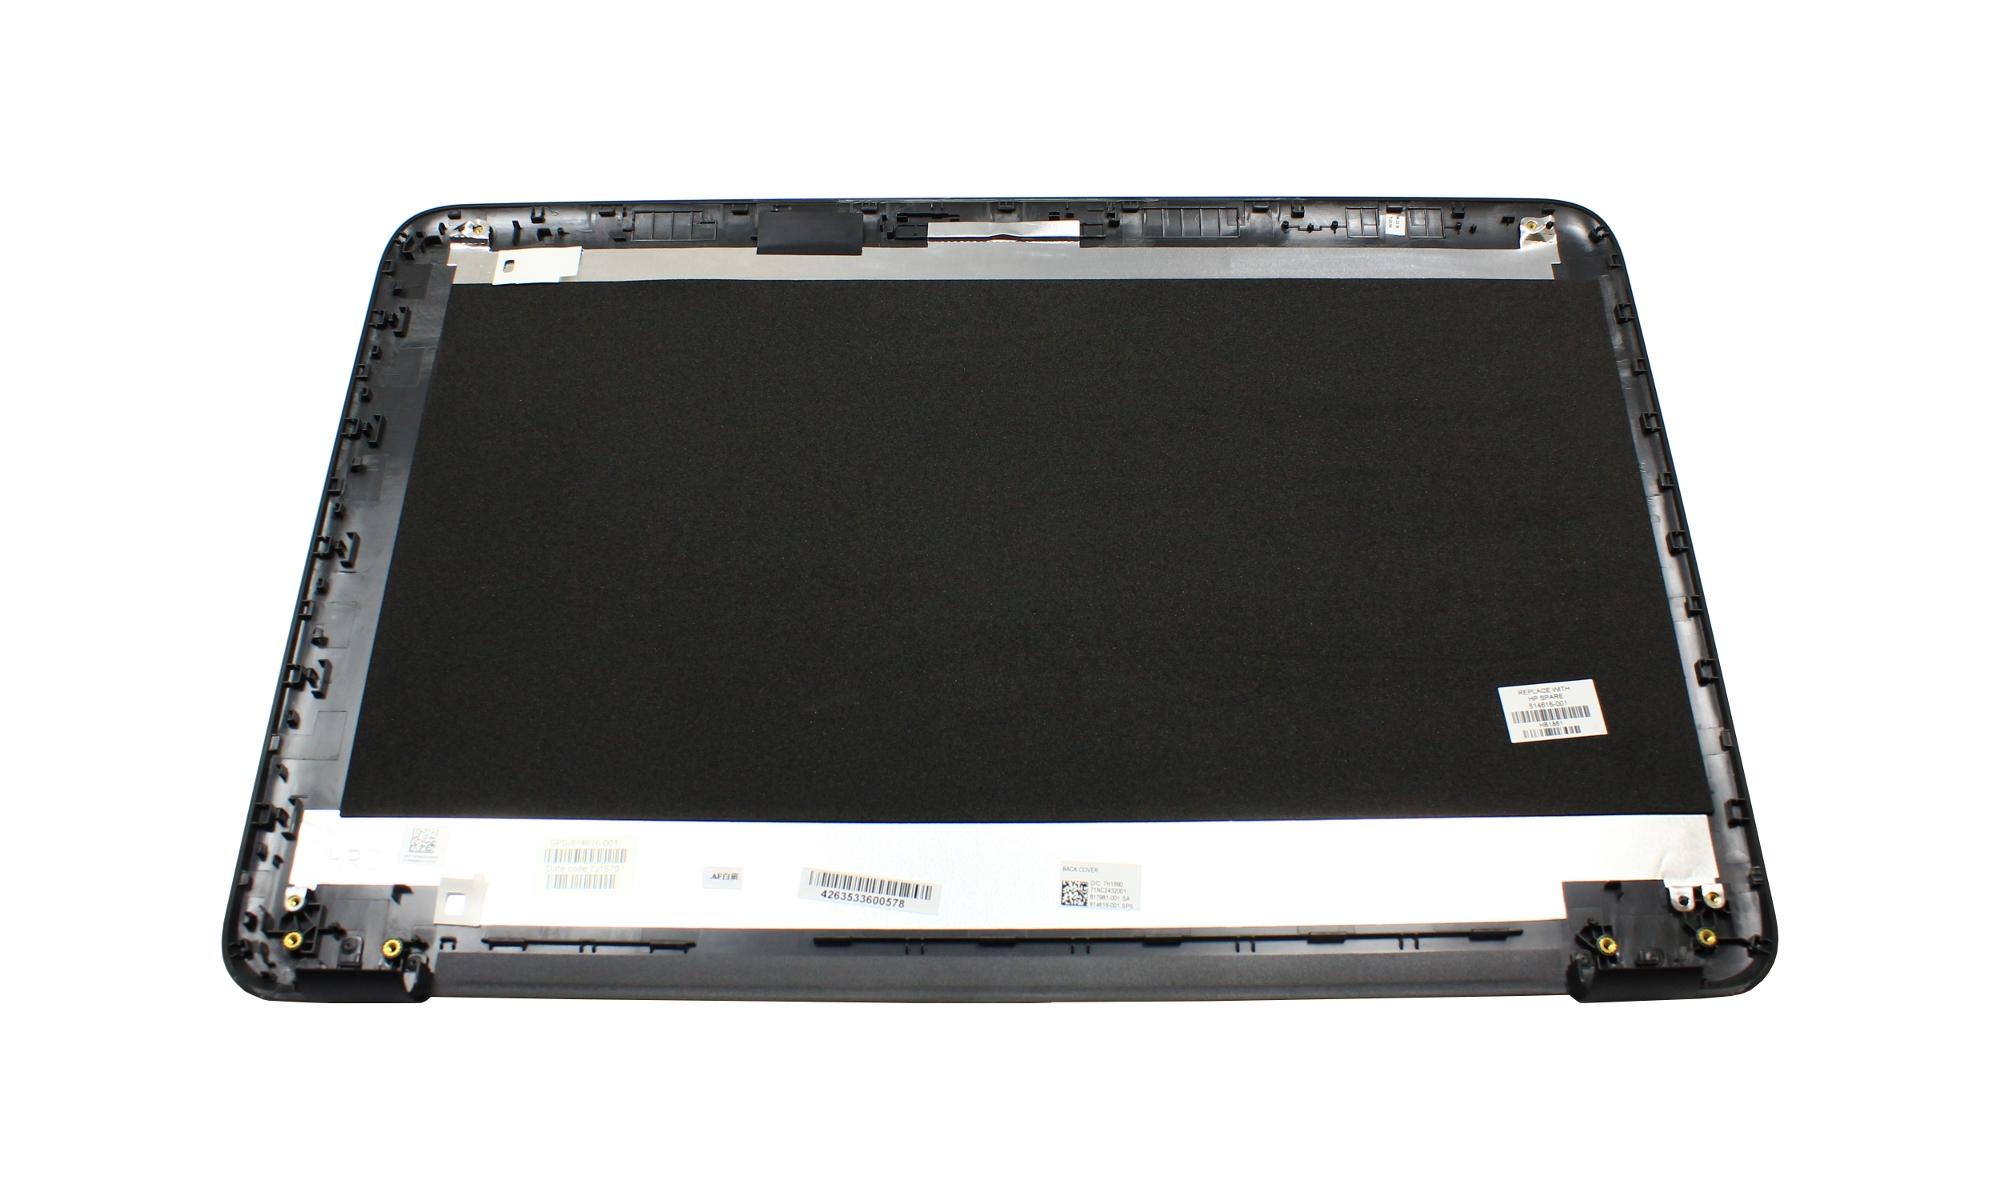 Capac display HP 256 G4